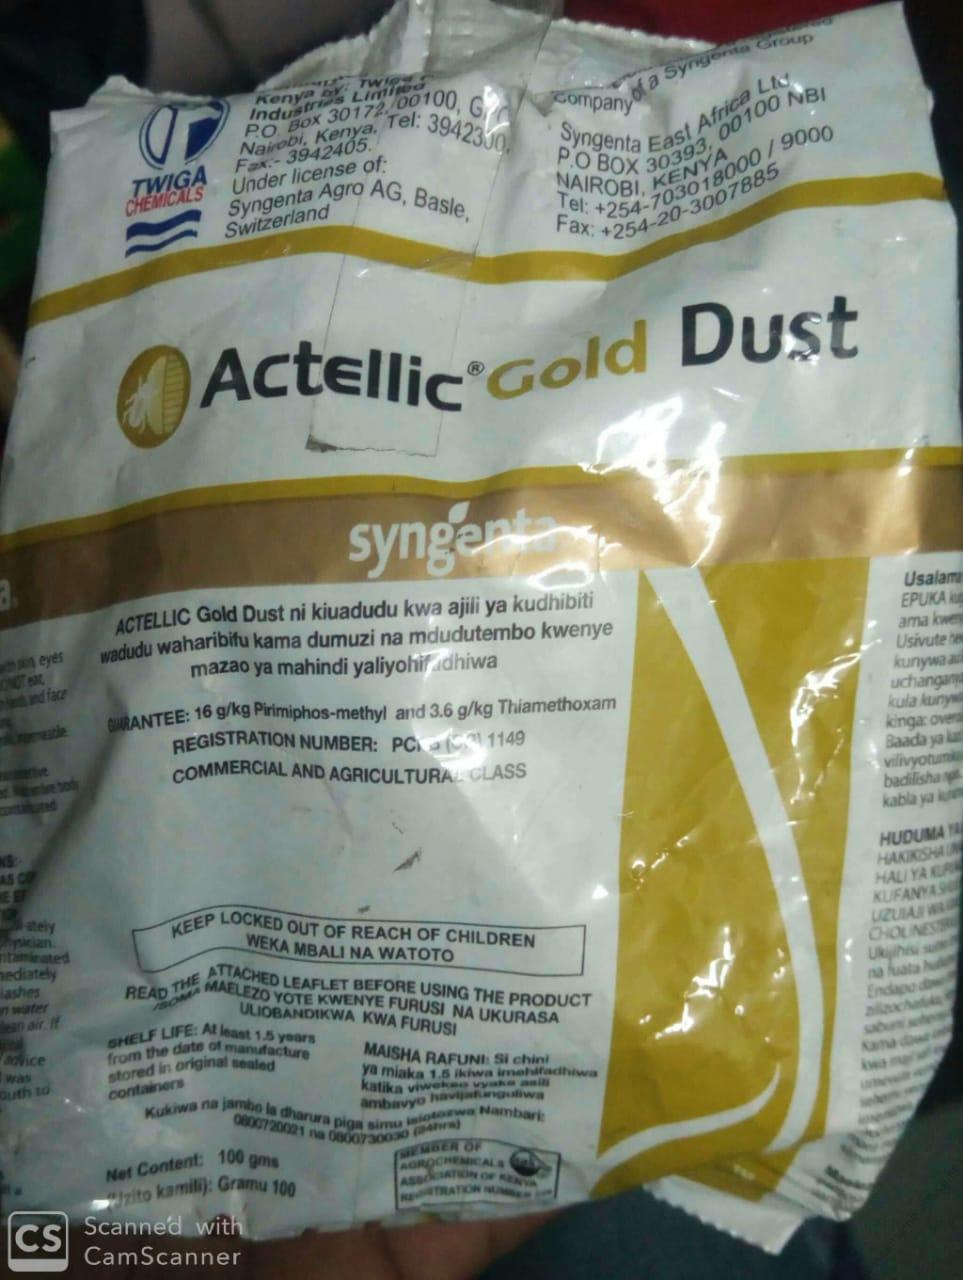 actellic-gold-dust-100g